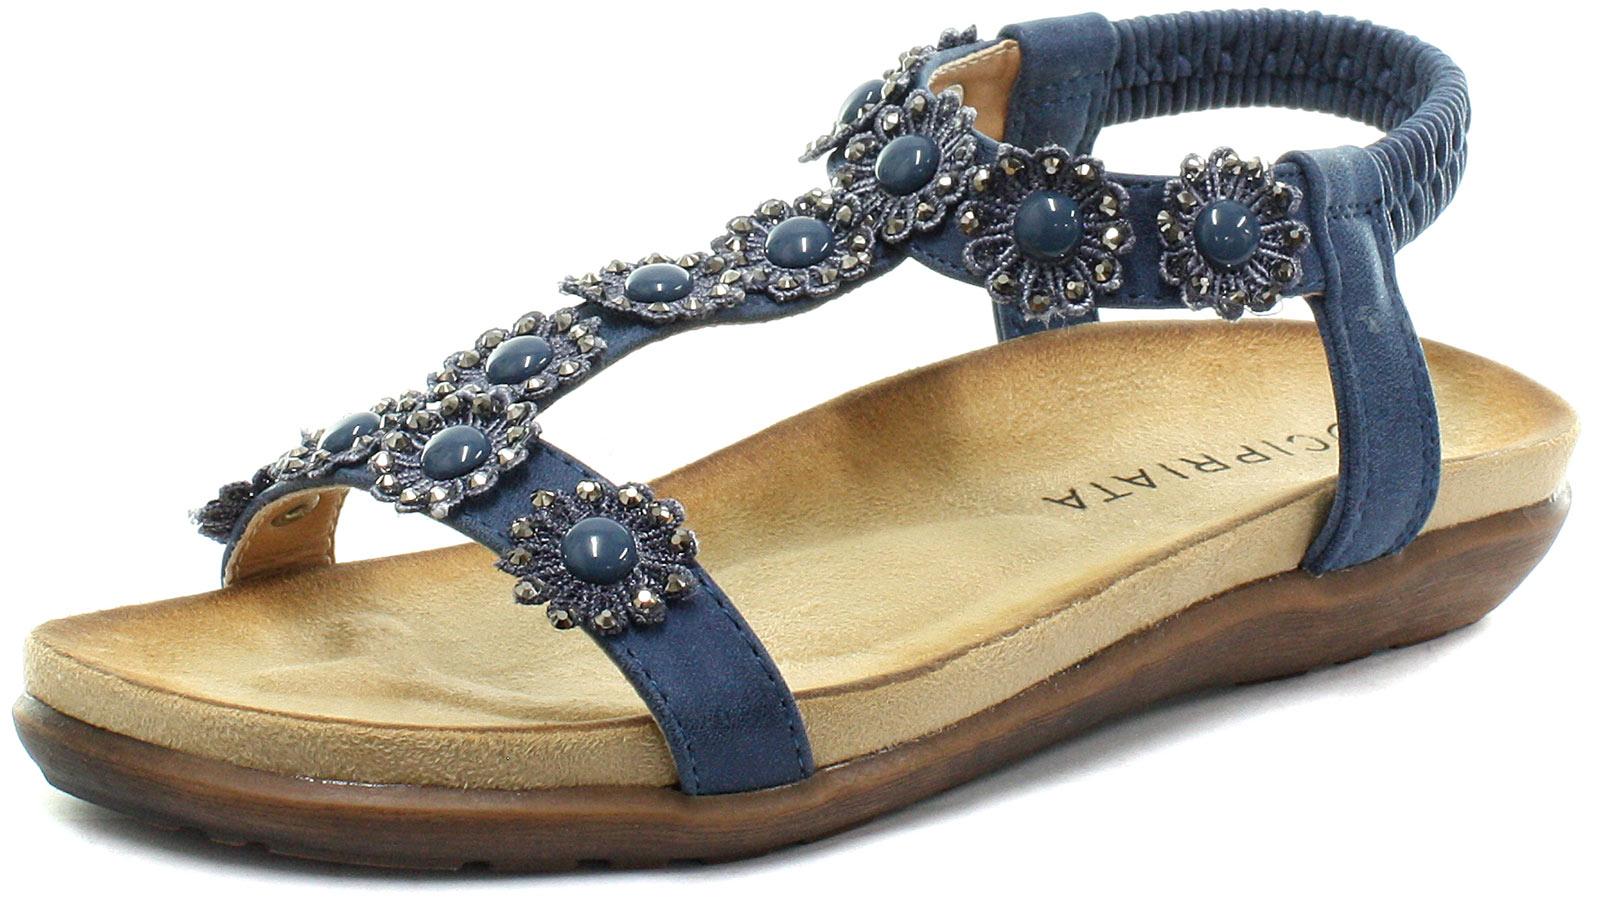 New-Cipriata-Giovanna-Navy-Flower-Womens-Halter-Back-Sandals-ALL-SIZES